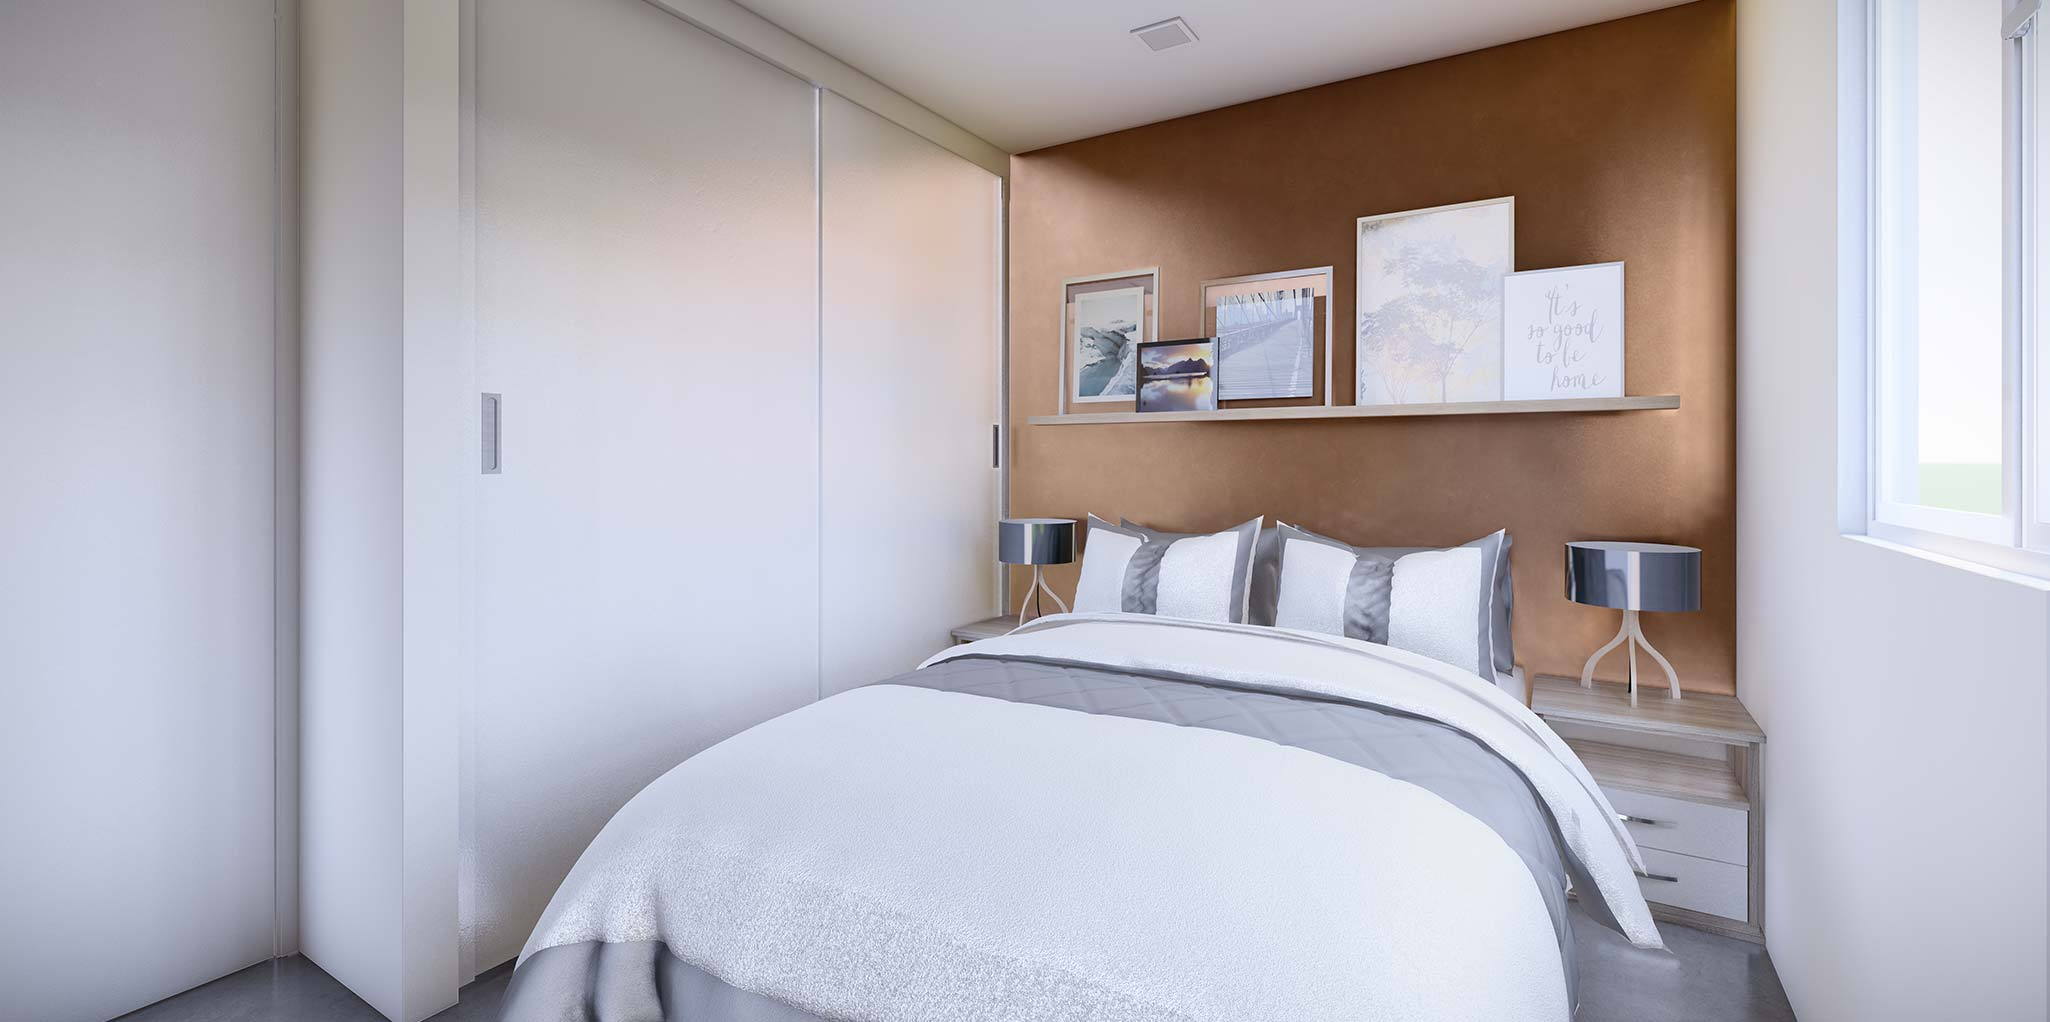 imagen-interior-residencial-oasis-sullana-2